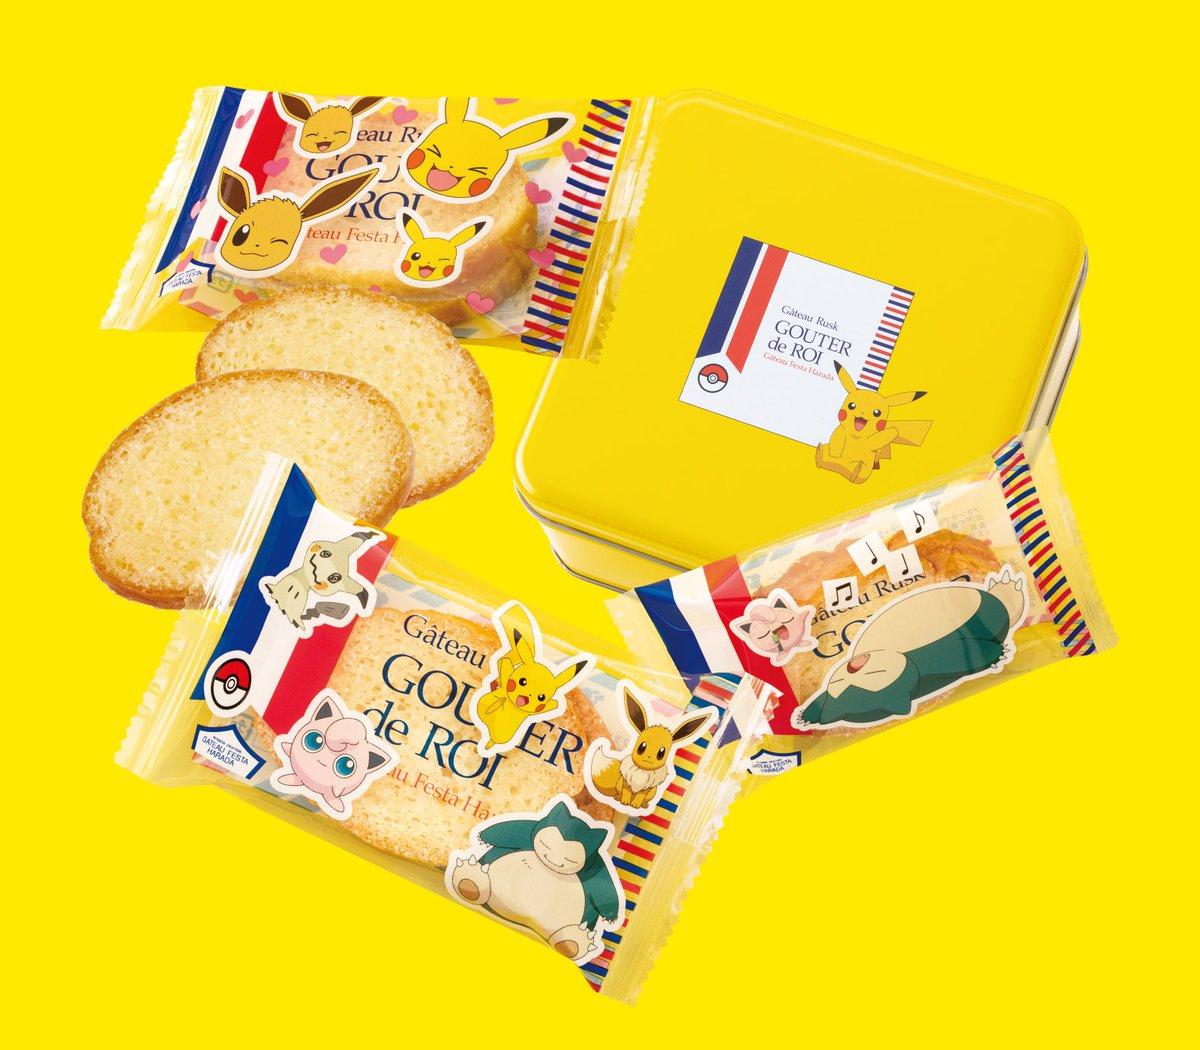 test ツイッターメディア - グーテデロワのポケモン缶かわいー! ピカチュウとイーブイは売り切れてた… https://t.co/0kziqO4cEH